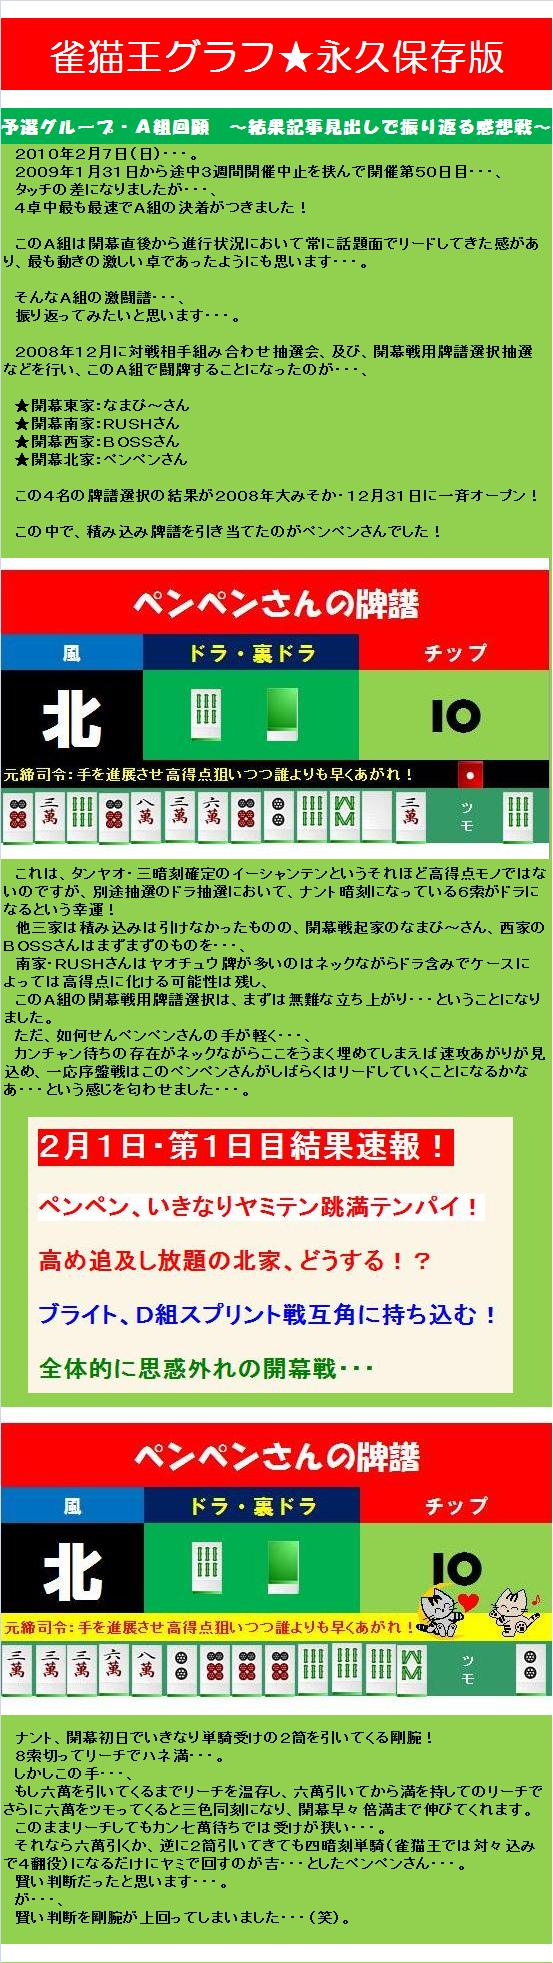 20100226・A組回顧02.jpg